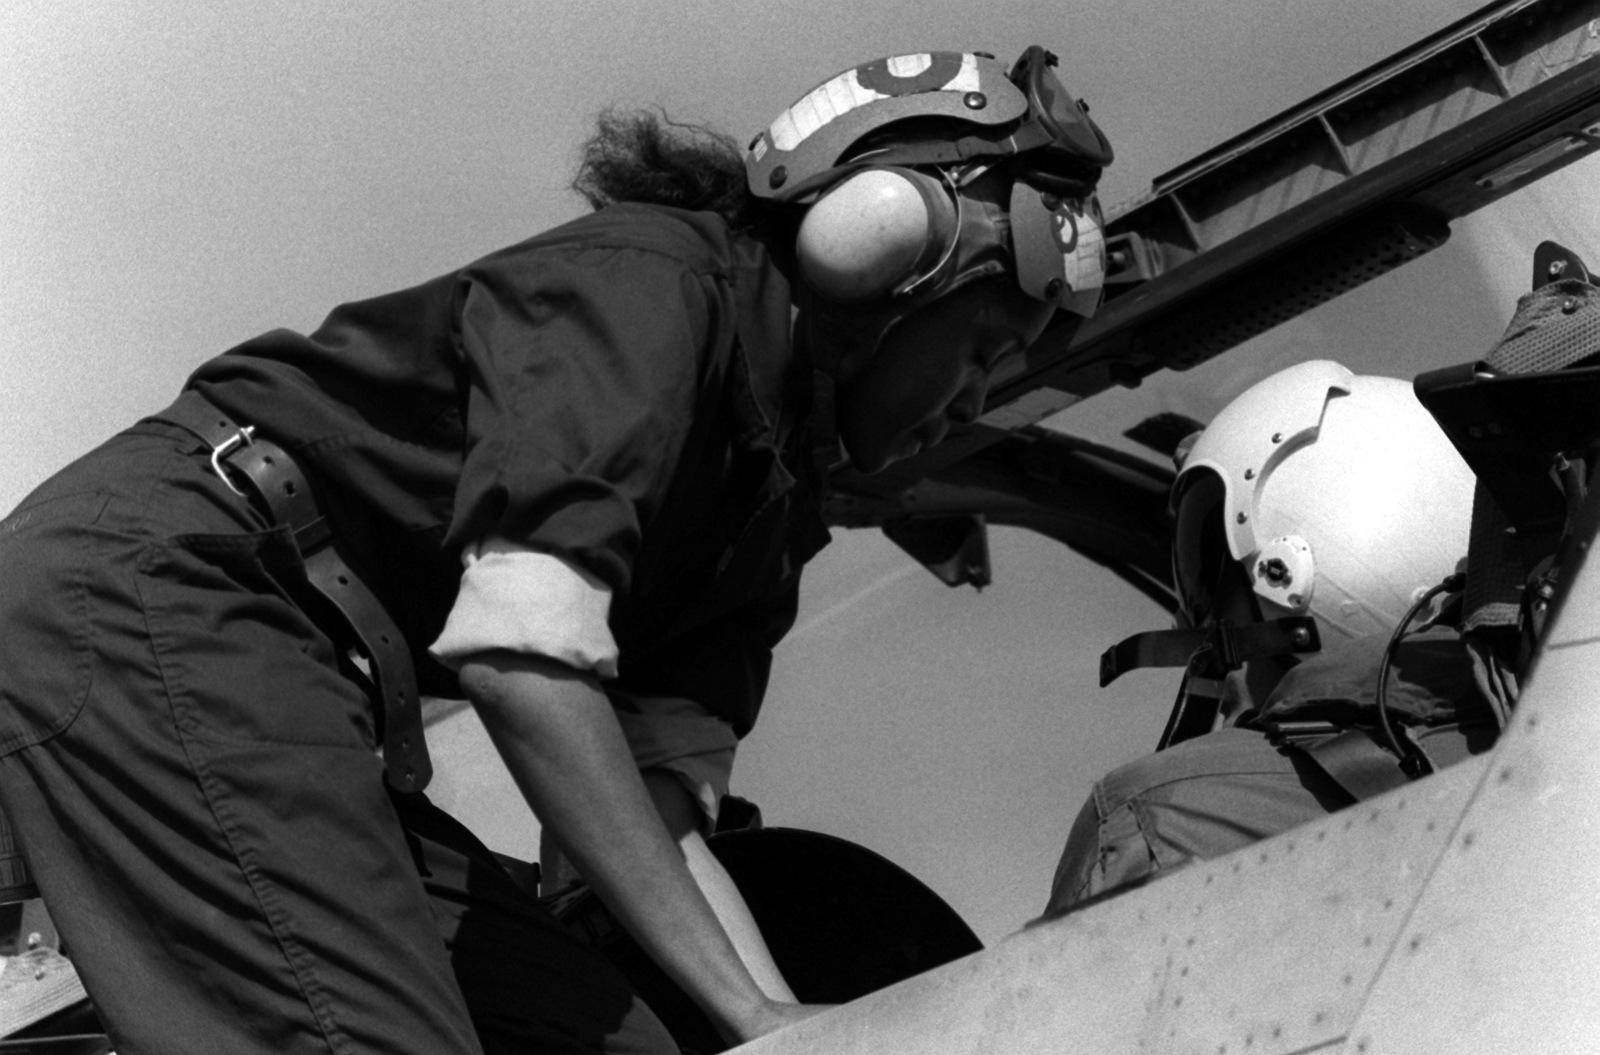 AIRMAN Ora Howard, plane captain, helps secure a pilot into the cockpit of an A-7 Corsair II aircraft